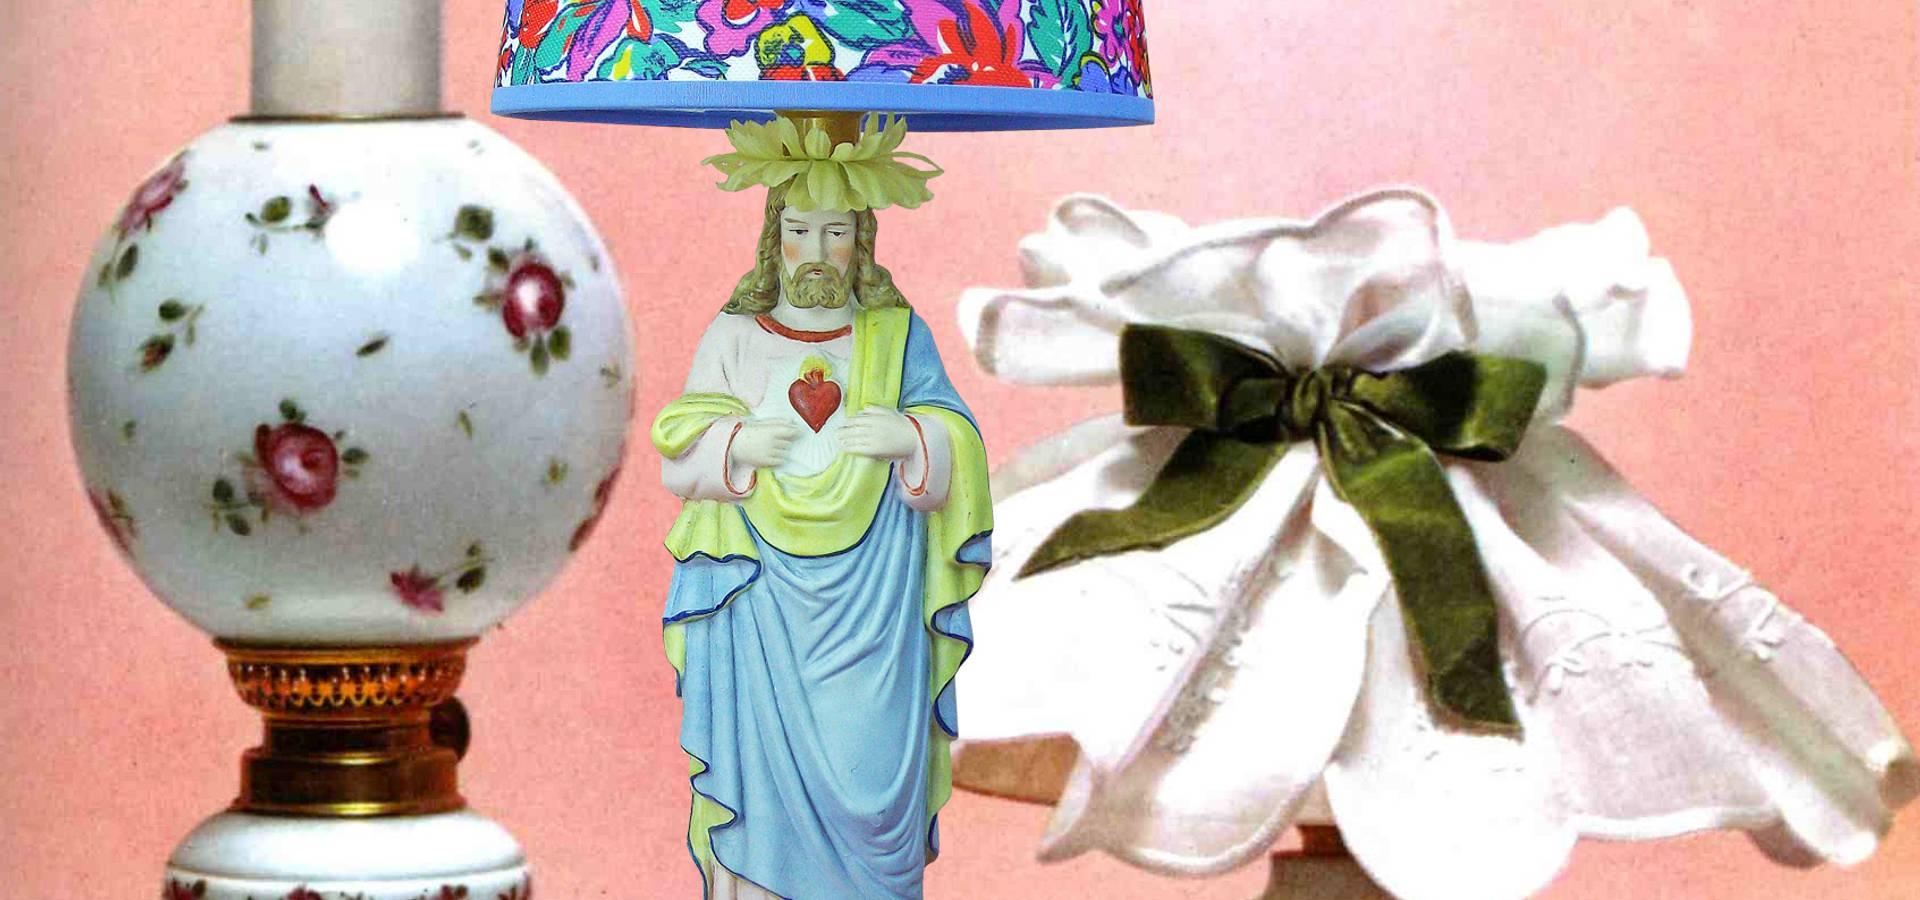 Les ineffables by marion laurent